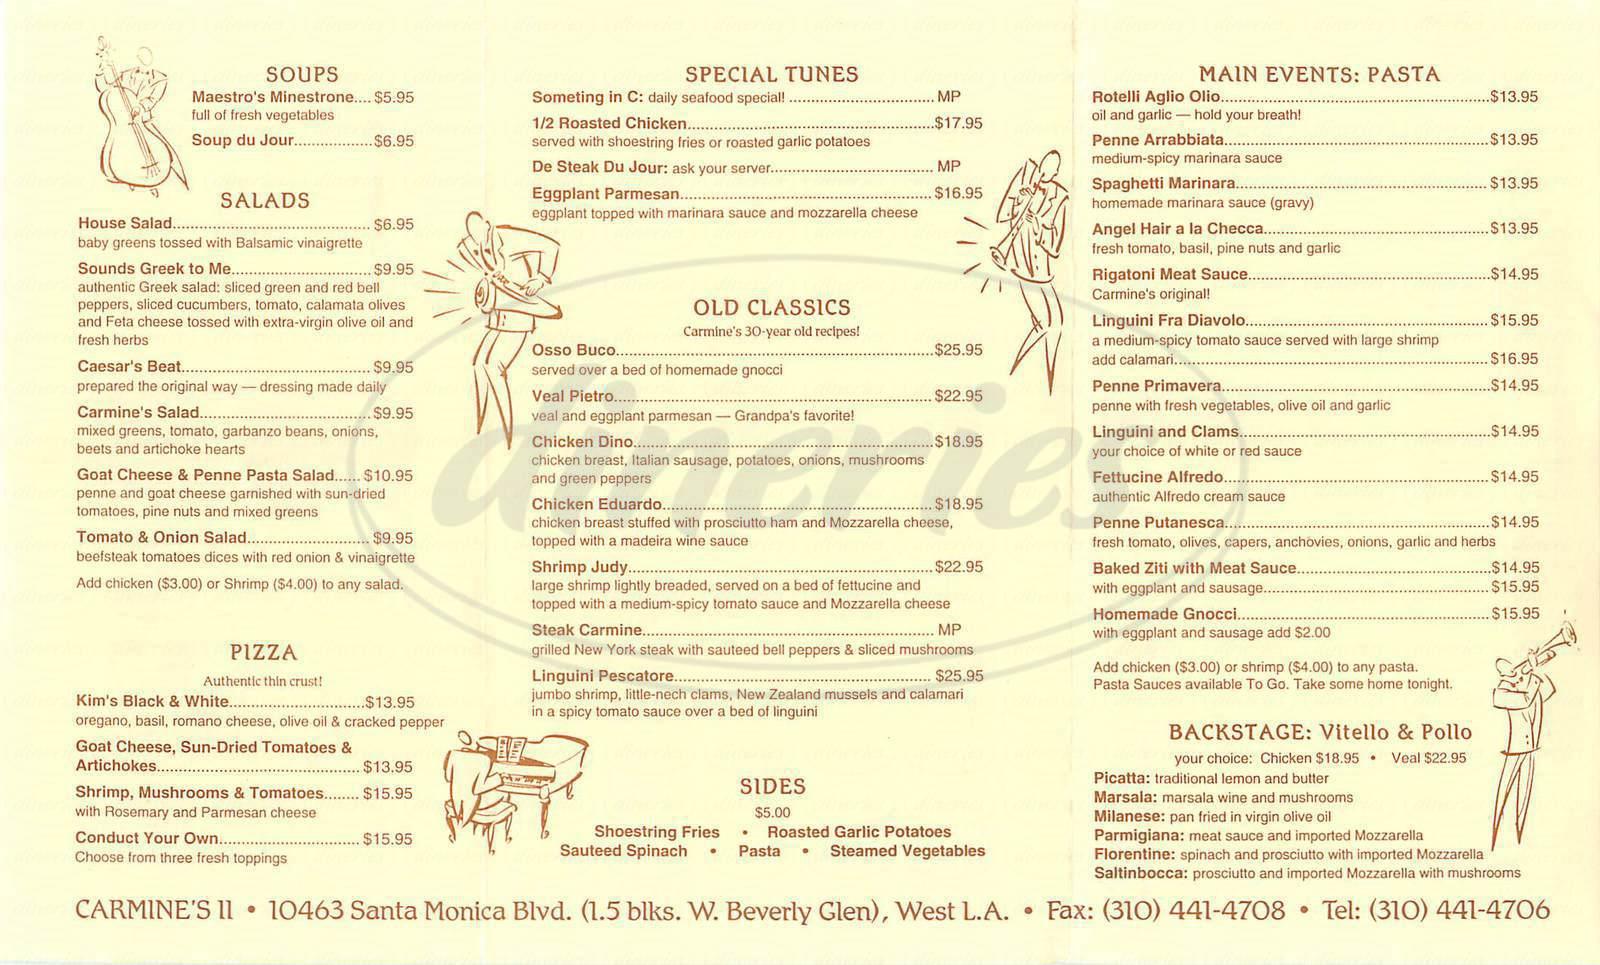 menu for Carmines II